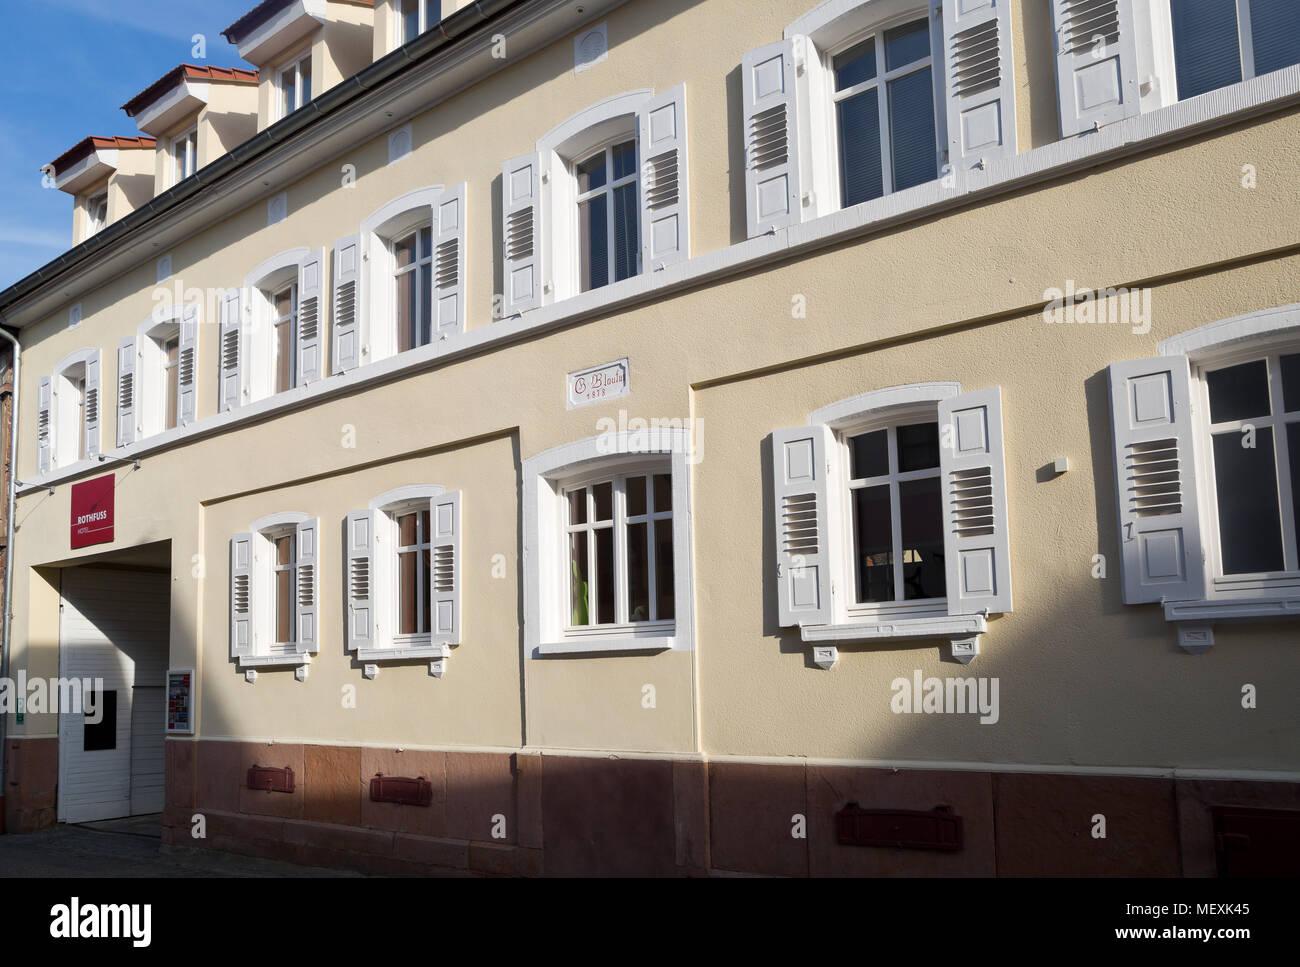 Hotel Rothfuss in Weisenheim am Berg, Rheinland-Pfalz, Germany, Europe - Stock Image